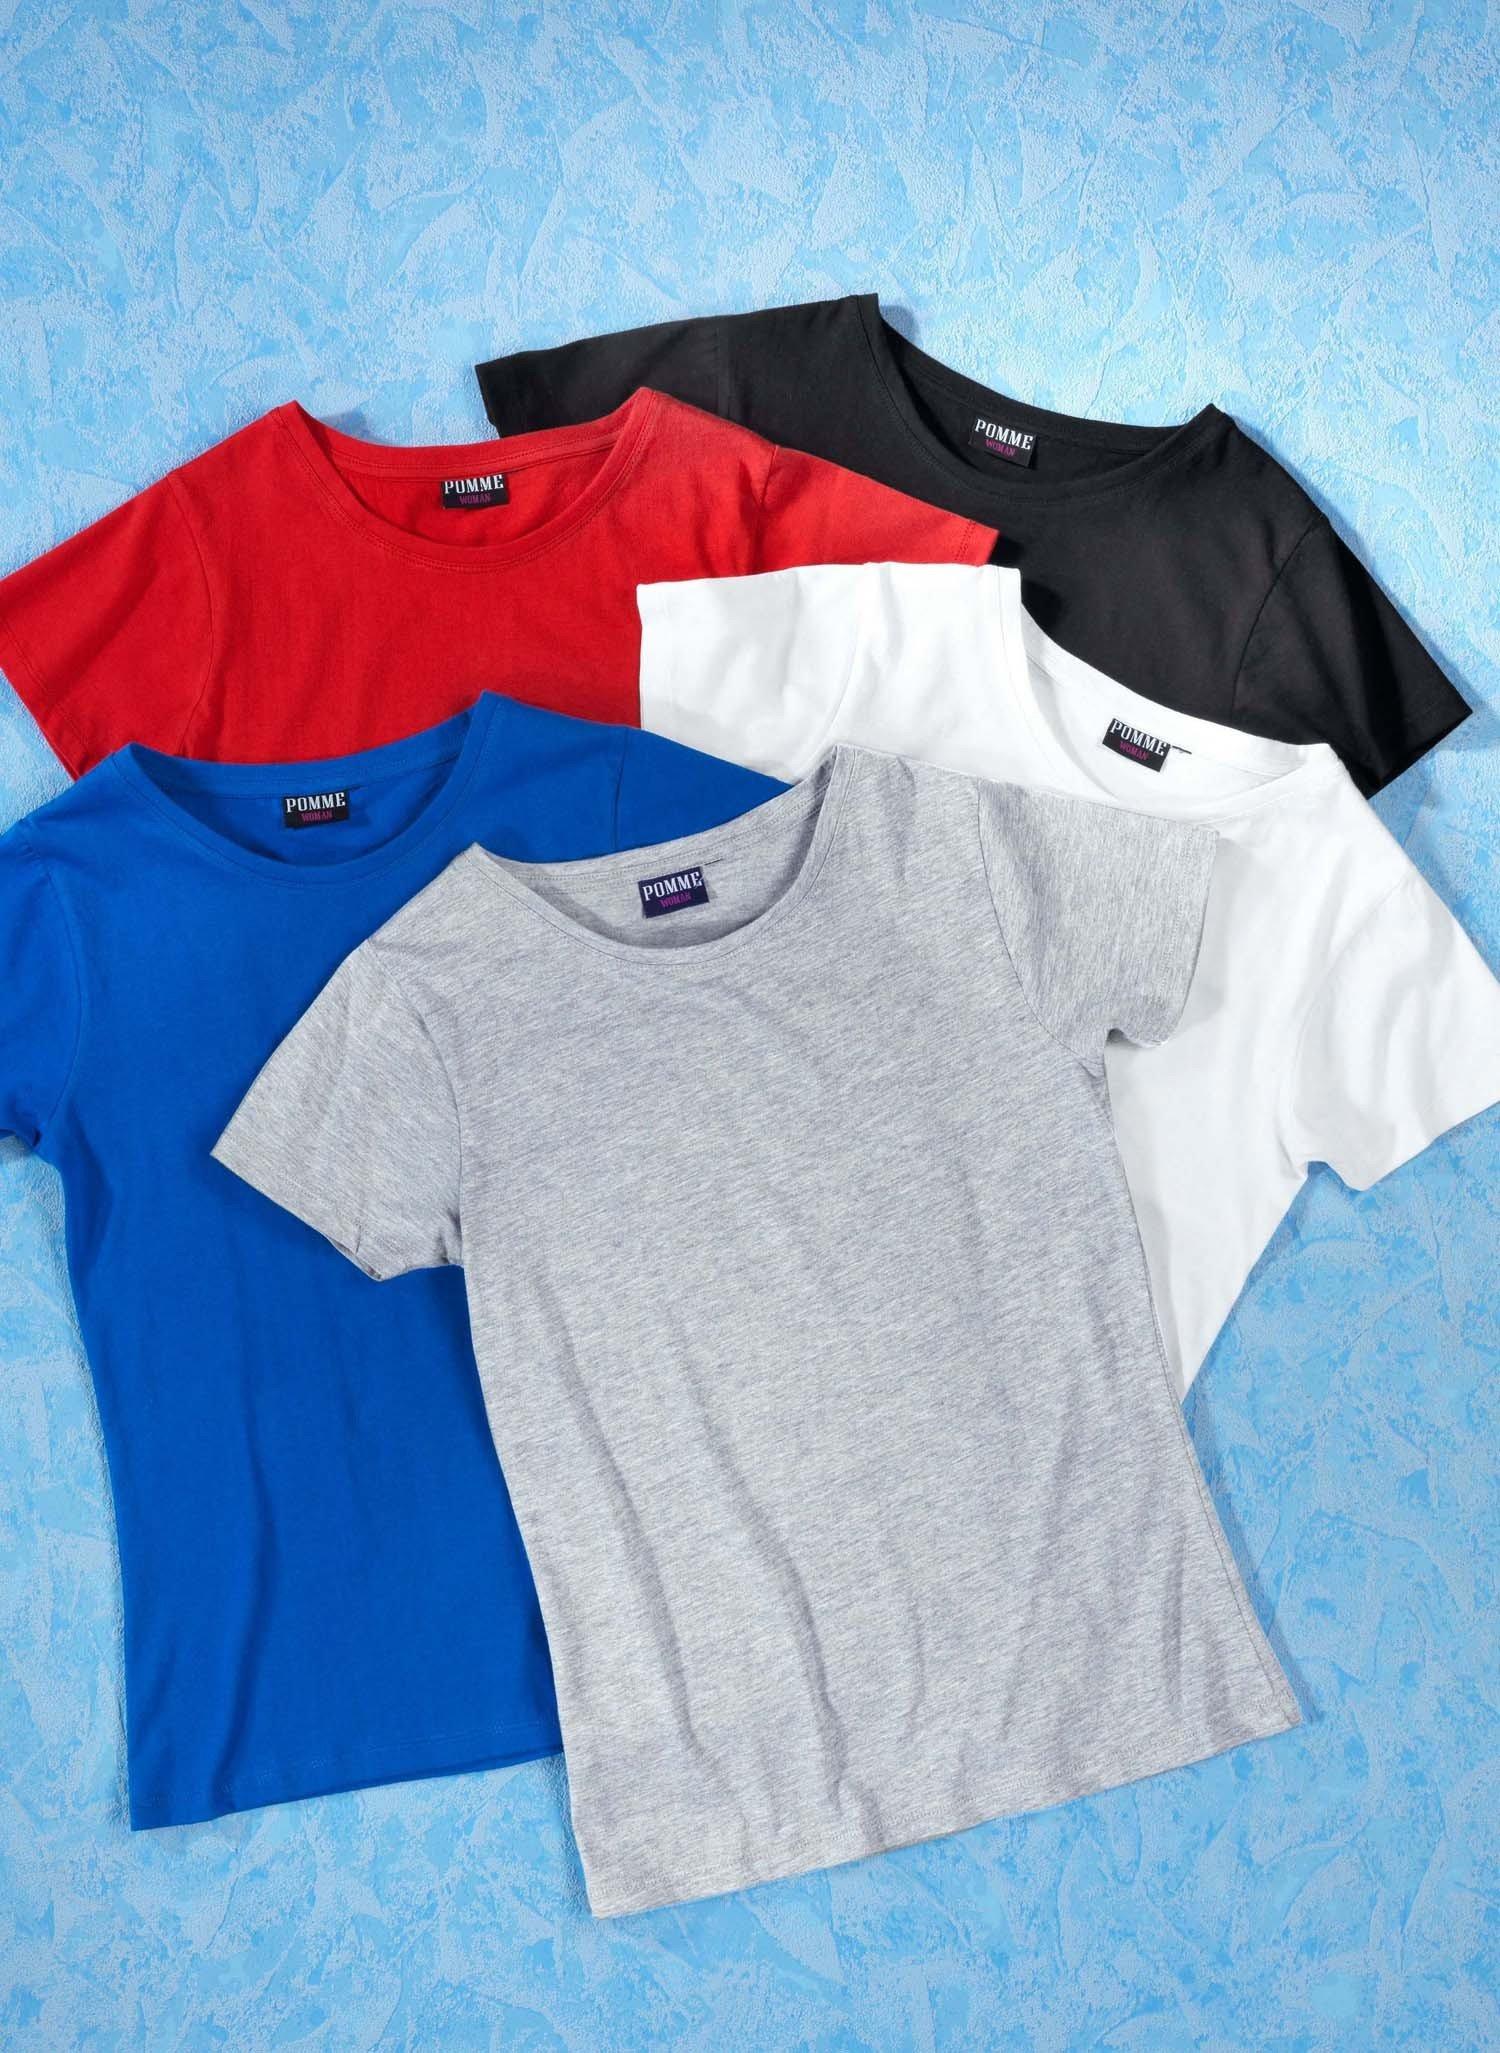 D-KA-Shirt,uni schwarz S 010 - 1 - Ronja.ch